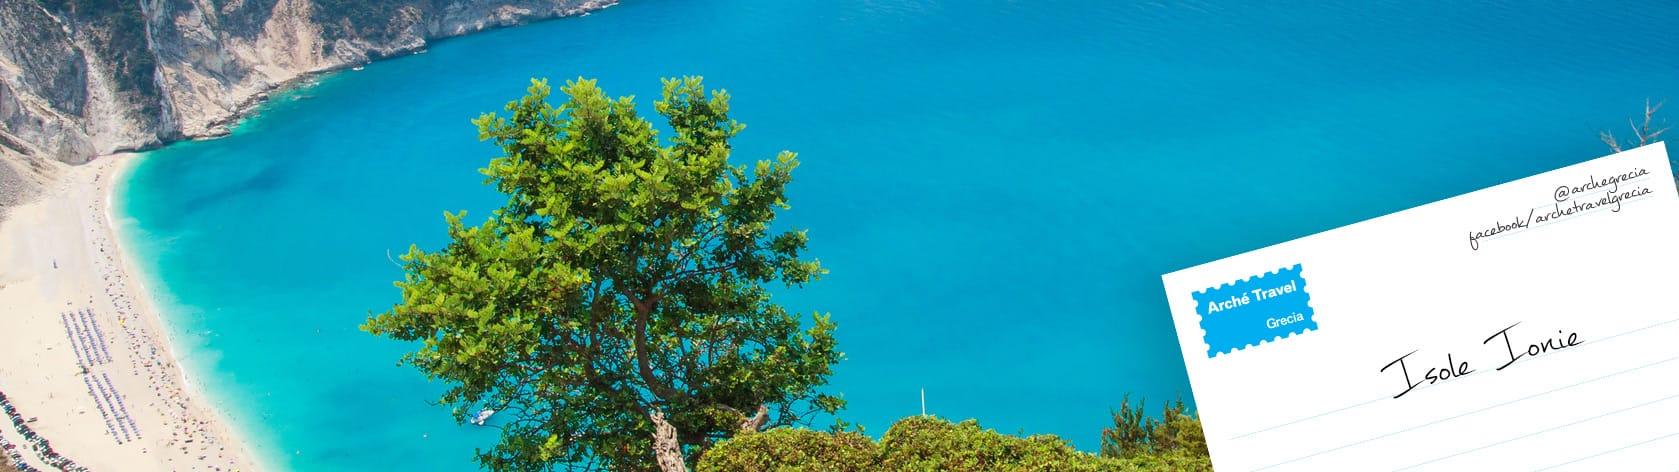 CATALOGHI Viaggi Isole Ionie Tour Isole Ionie - Arché Travel - Tour Operator Isole Ionie Grecia